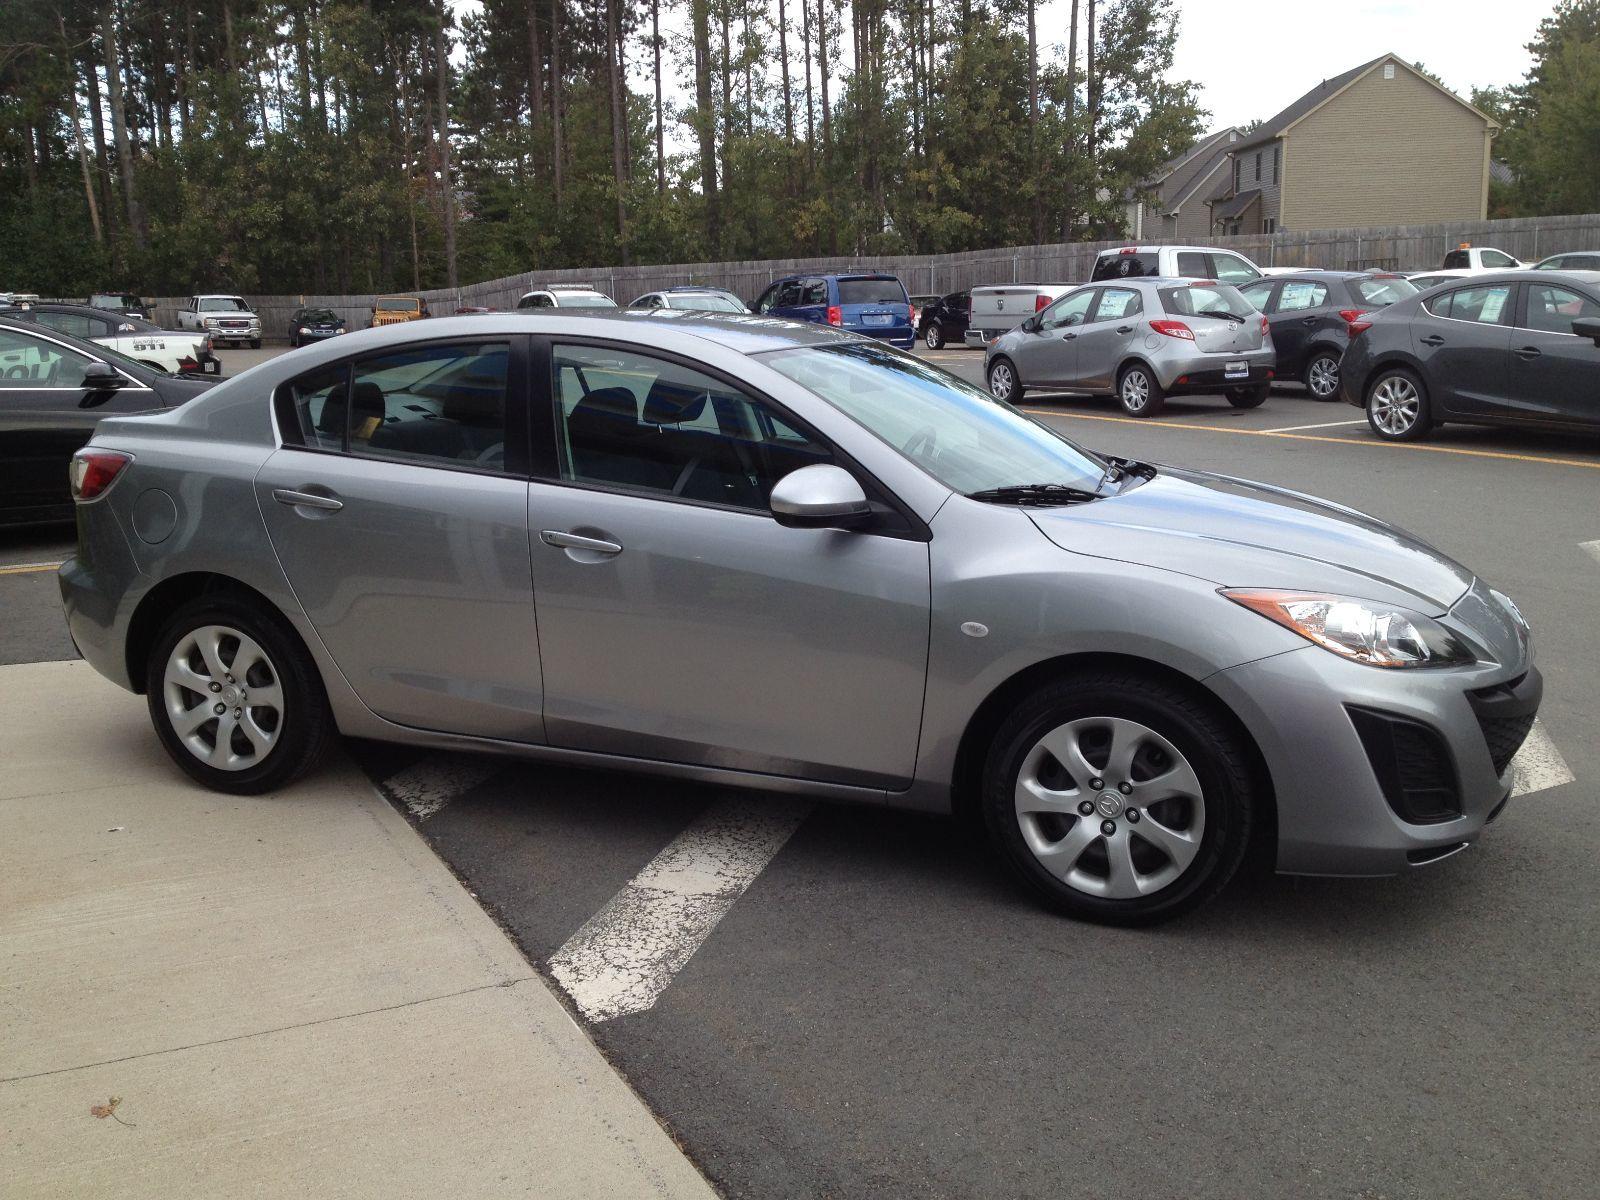 Used Mazda Kentville Inventory Nova Scotia